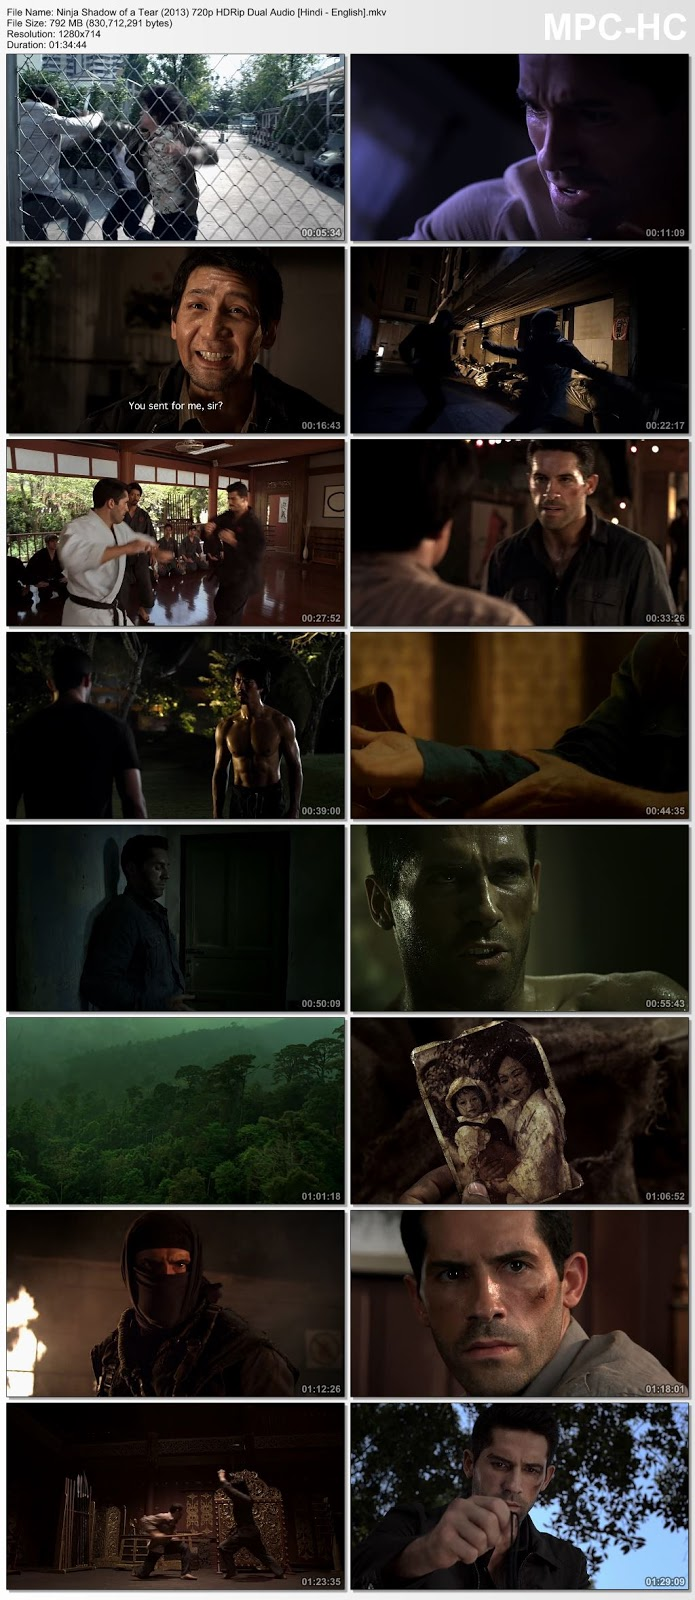 Ninja: Shadow of a Tear (2013) 720p HDRip Dual Audio [Hindi – English] – 800MB Desirehub